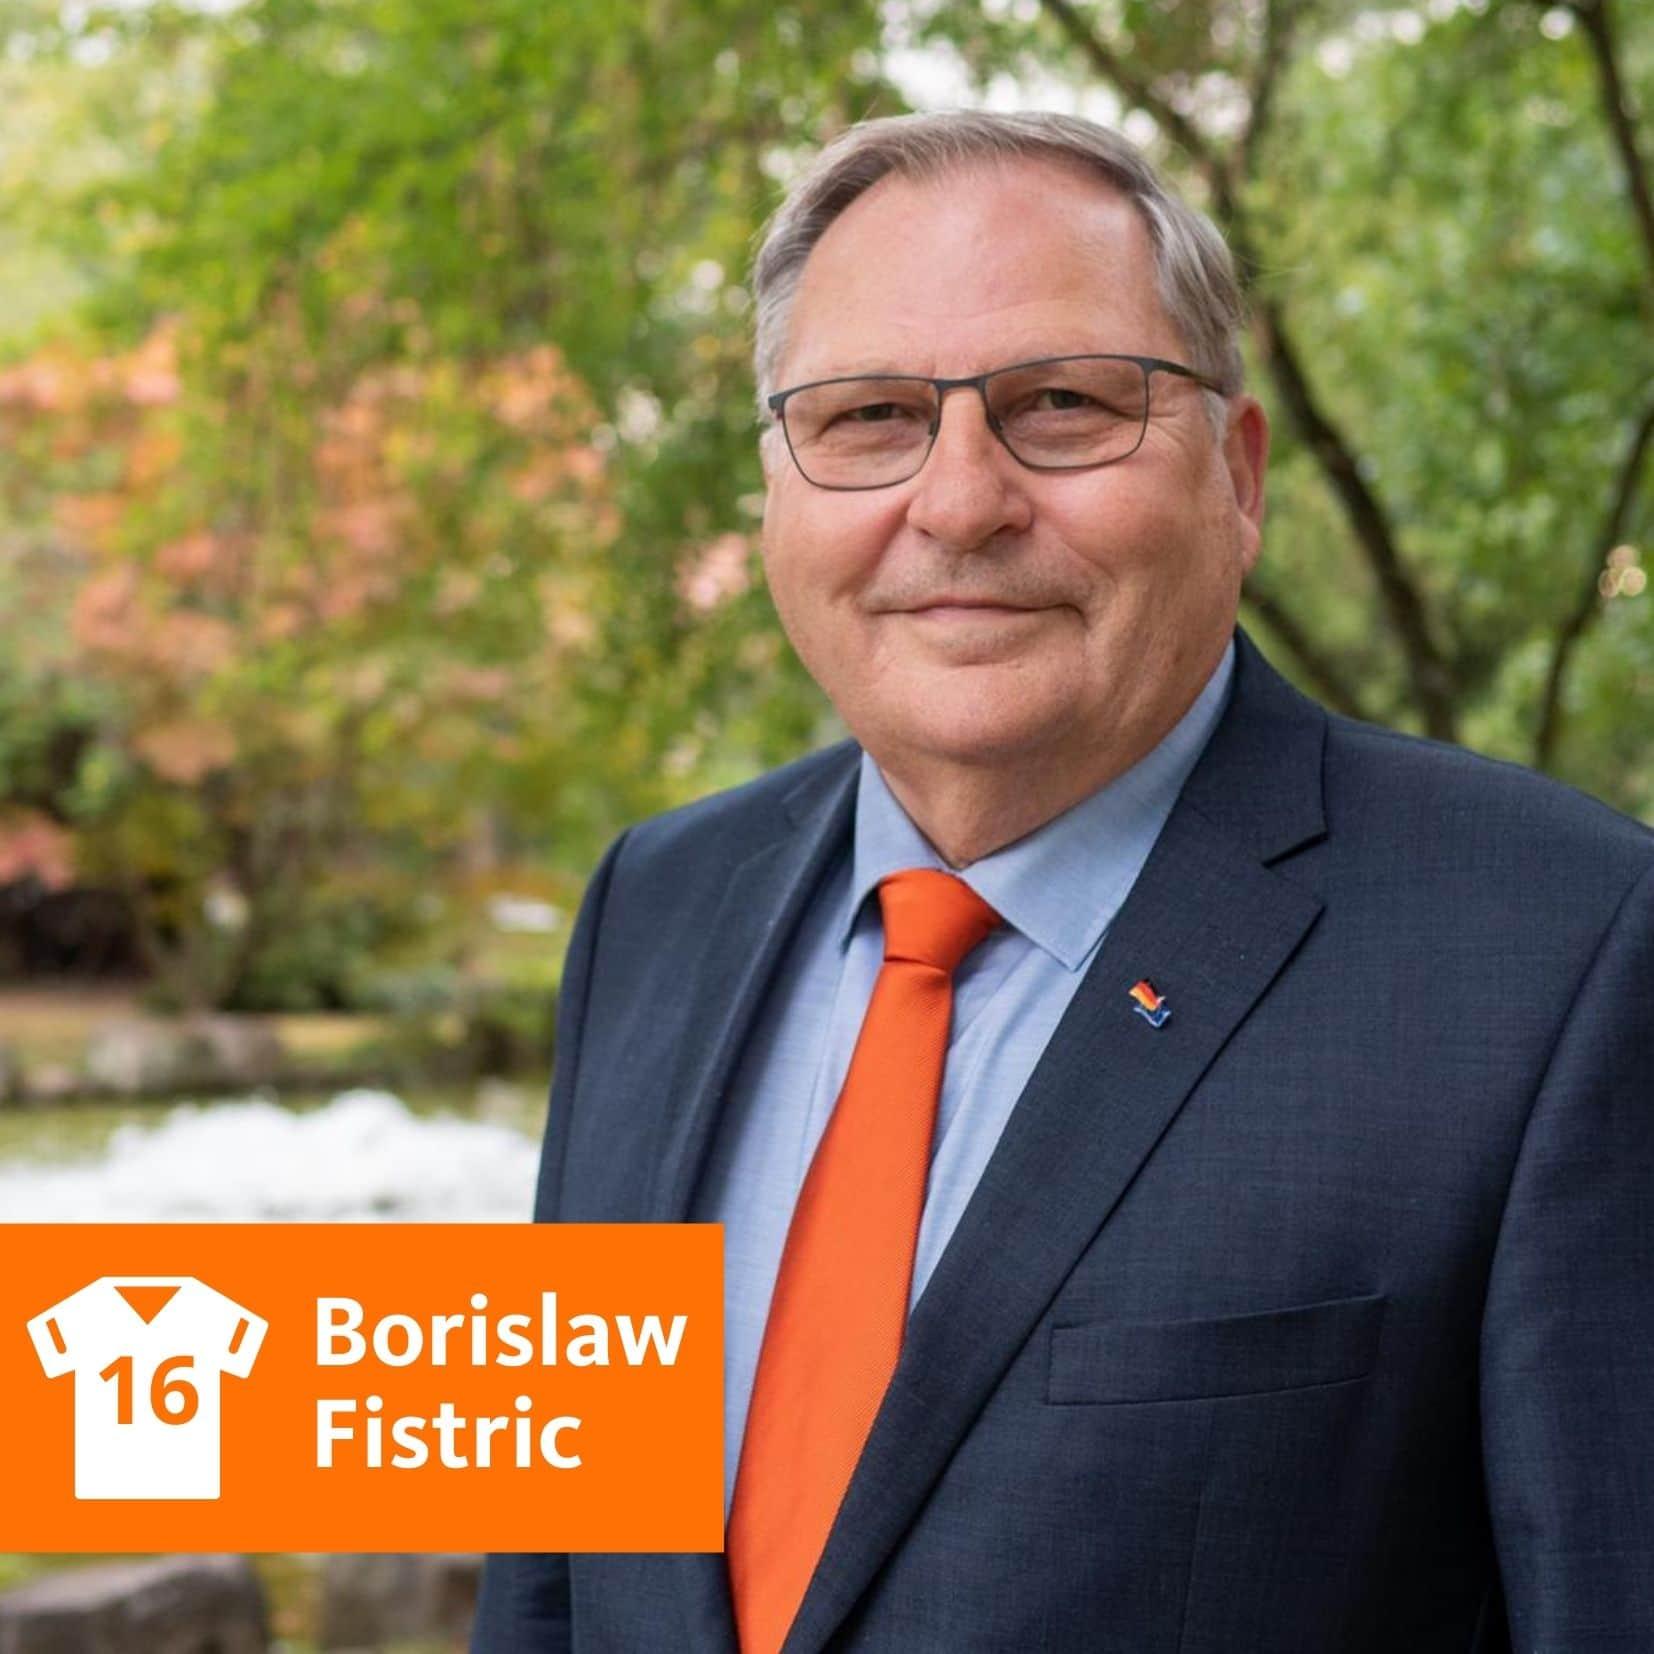 Borislaw Fistric